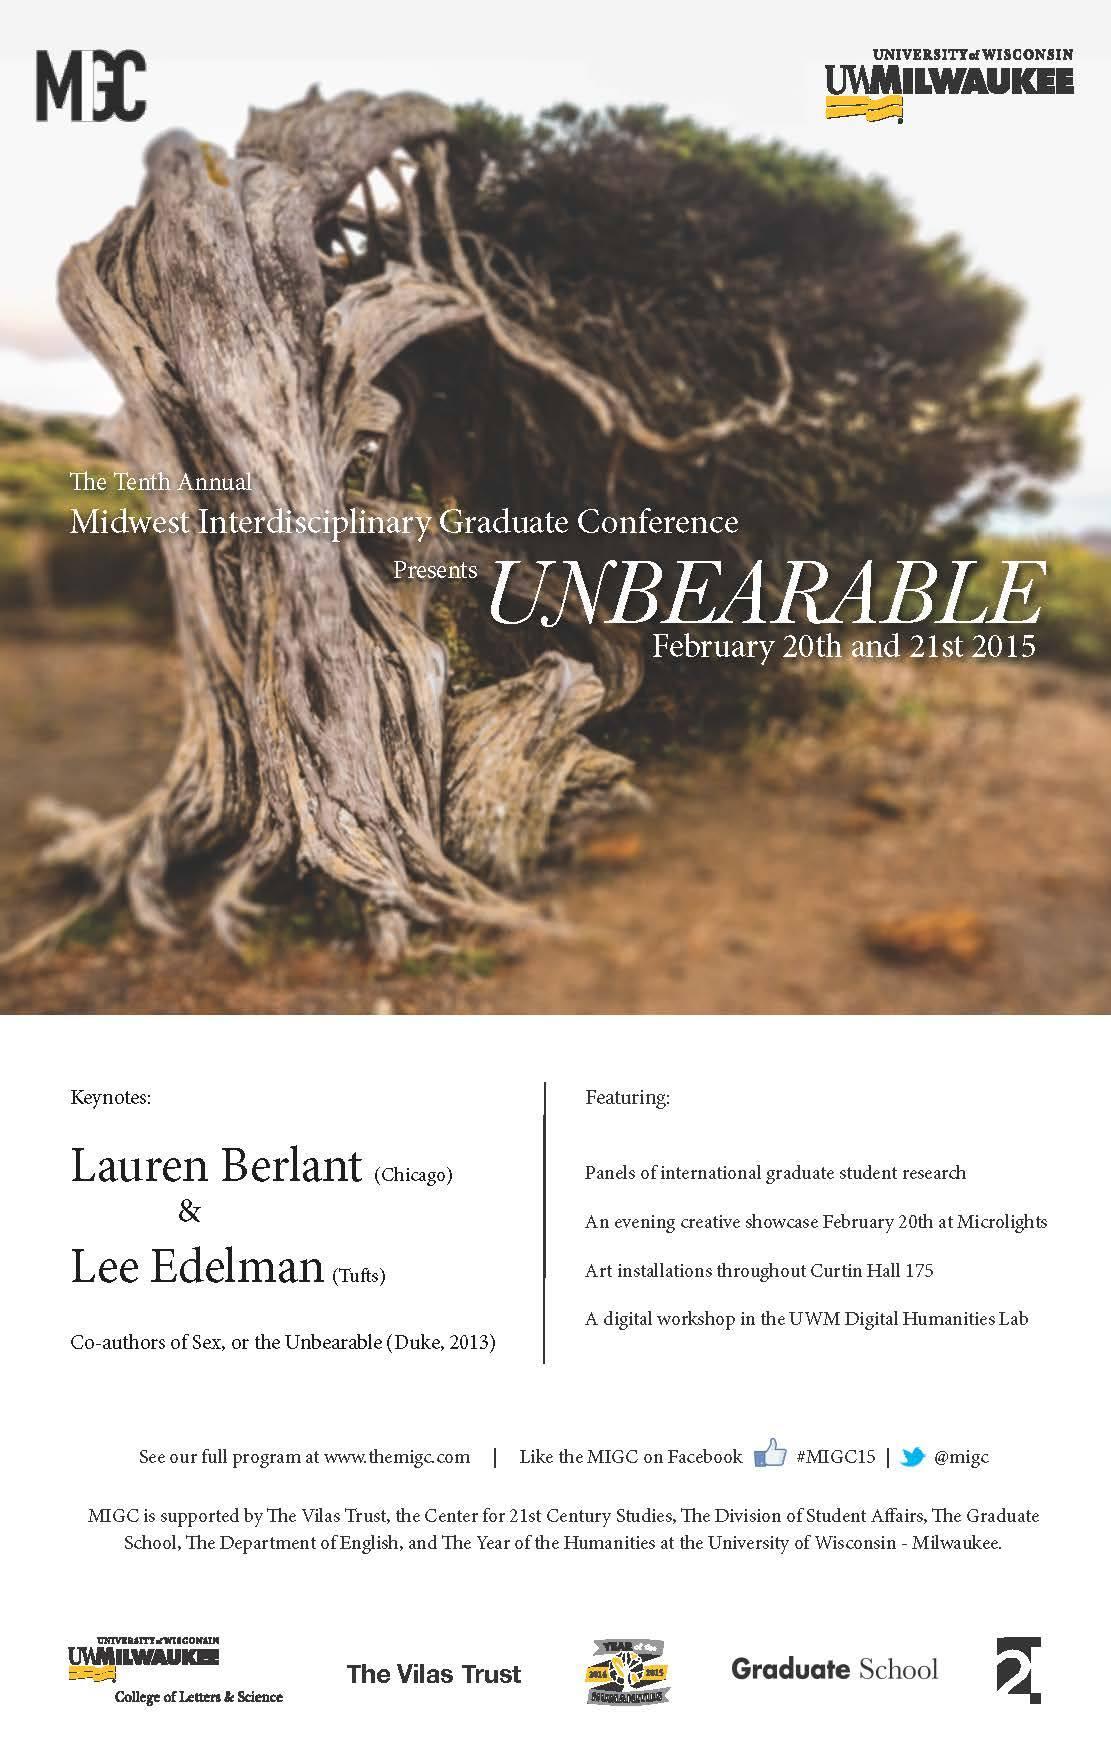 MIGC 2015: Unbearable